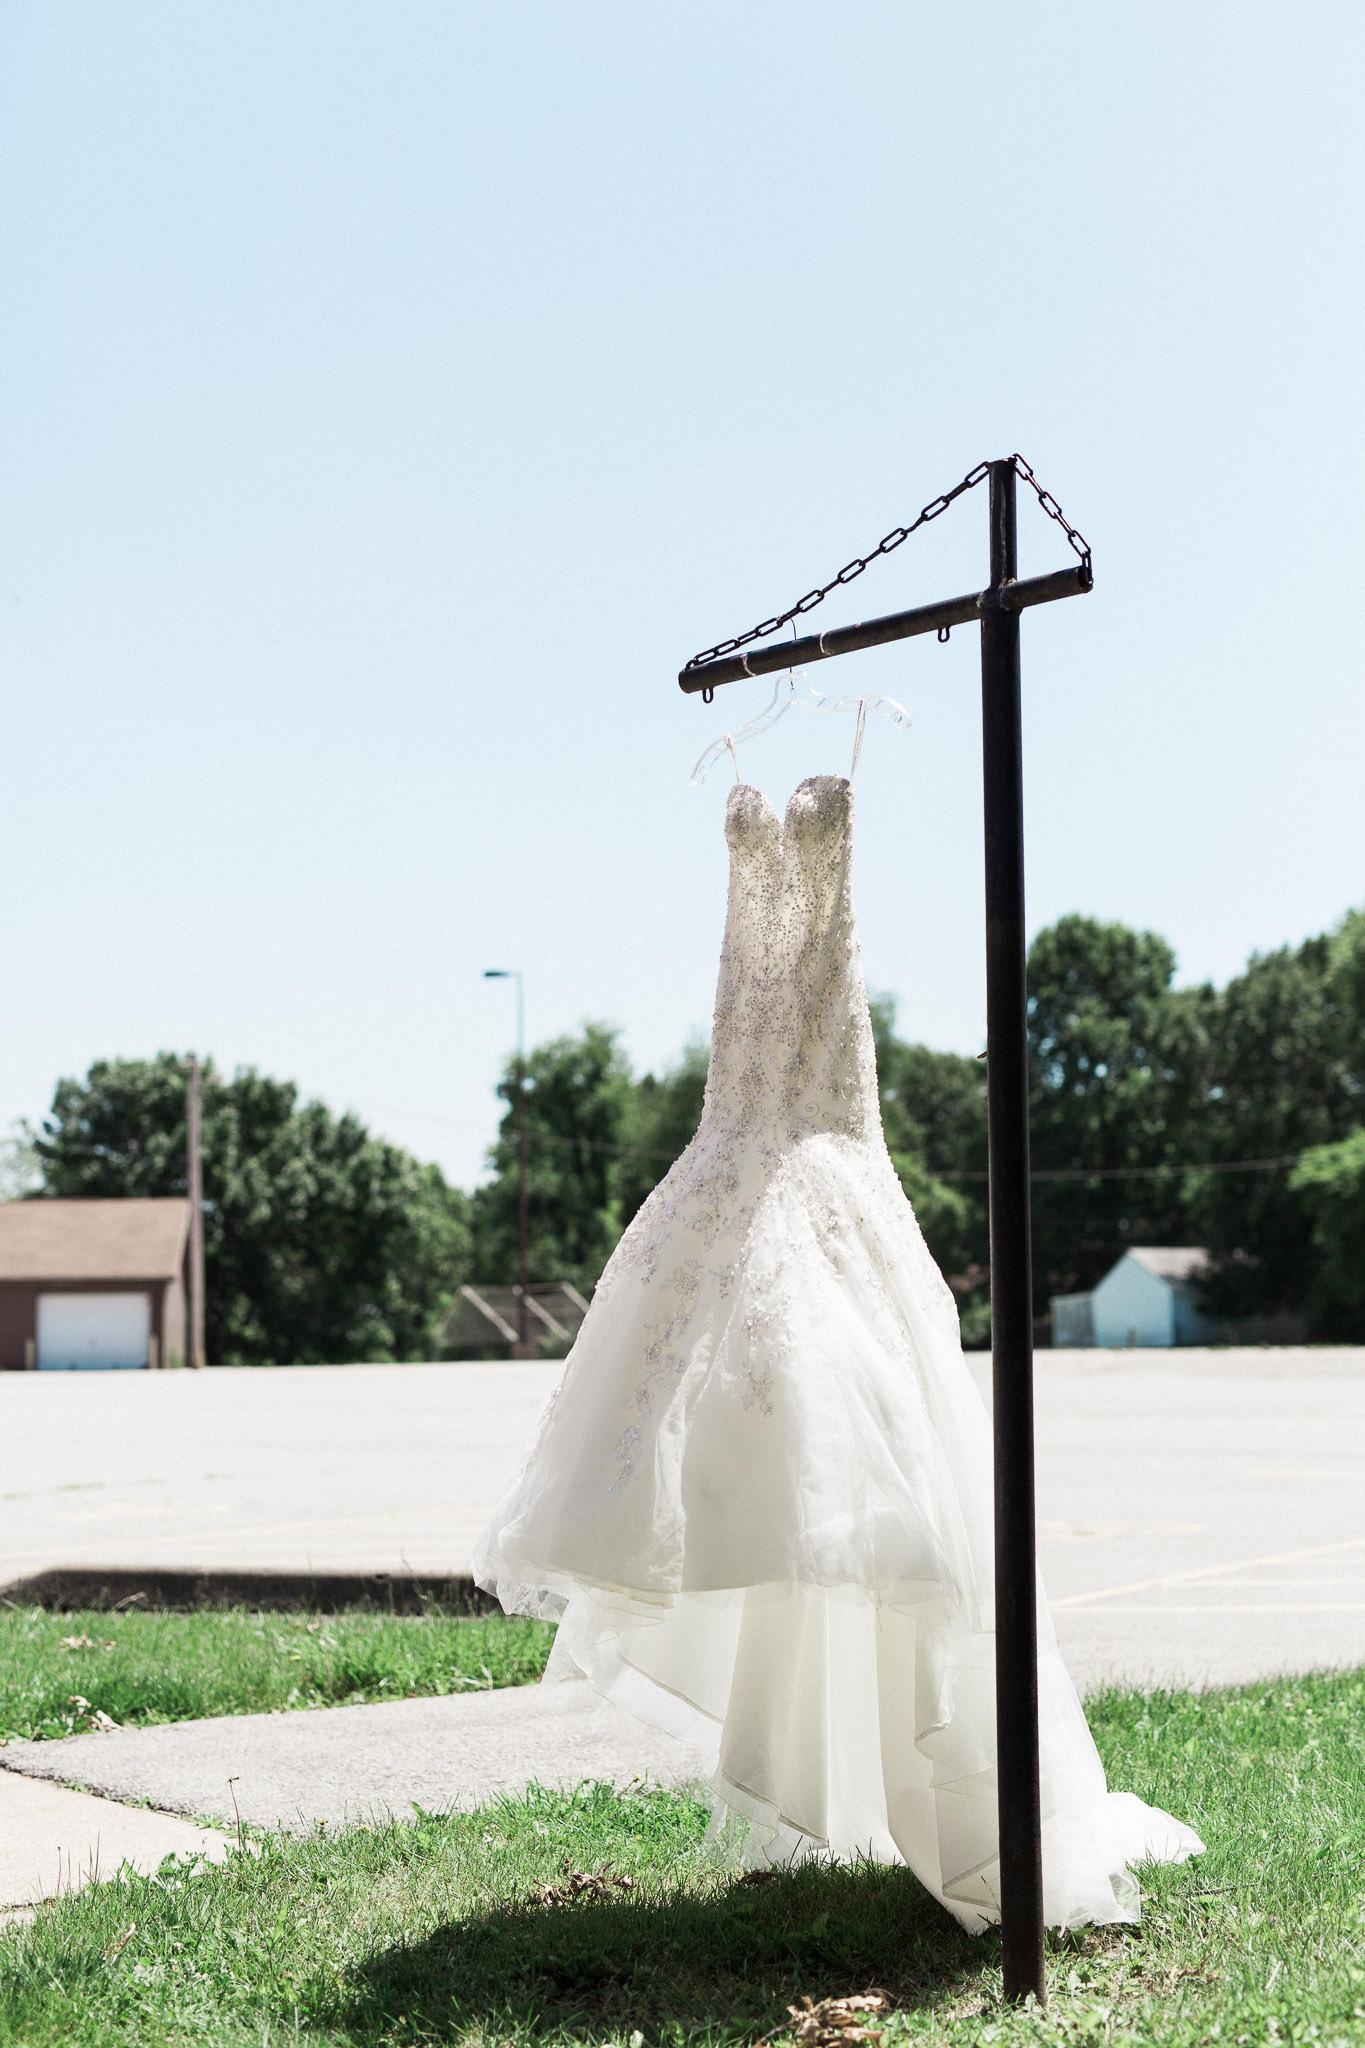 st-louis-photographer-machinist-hall-wedding-1.jpg